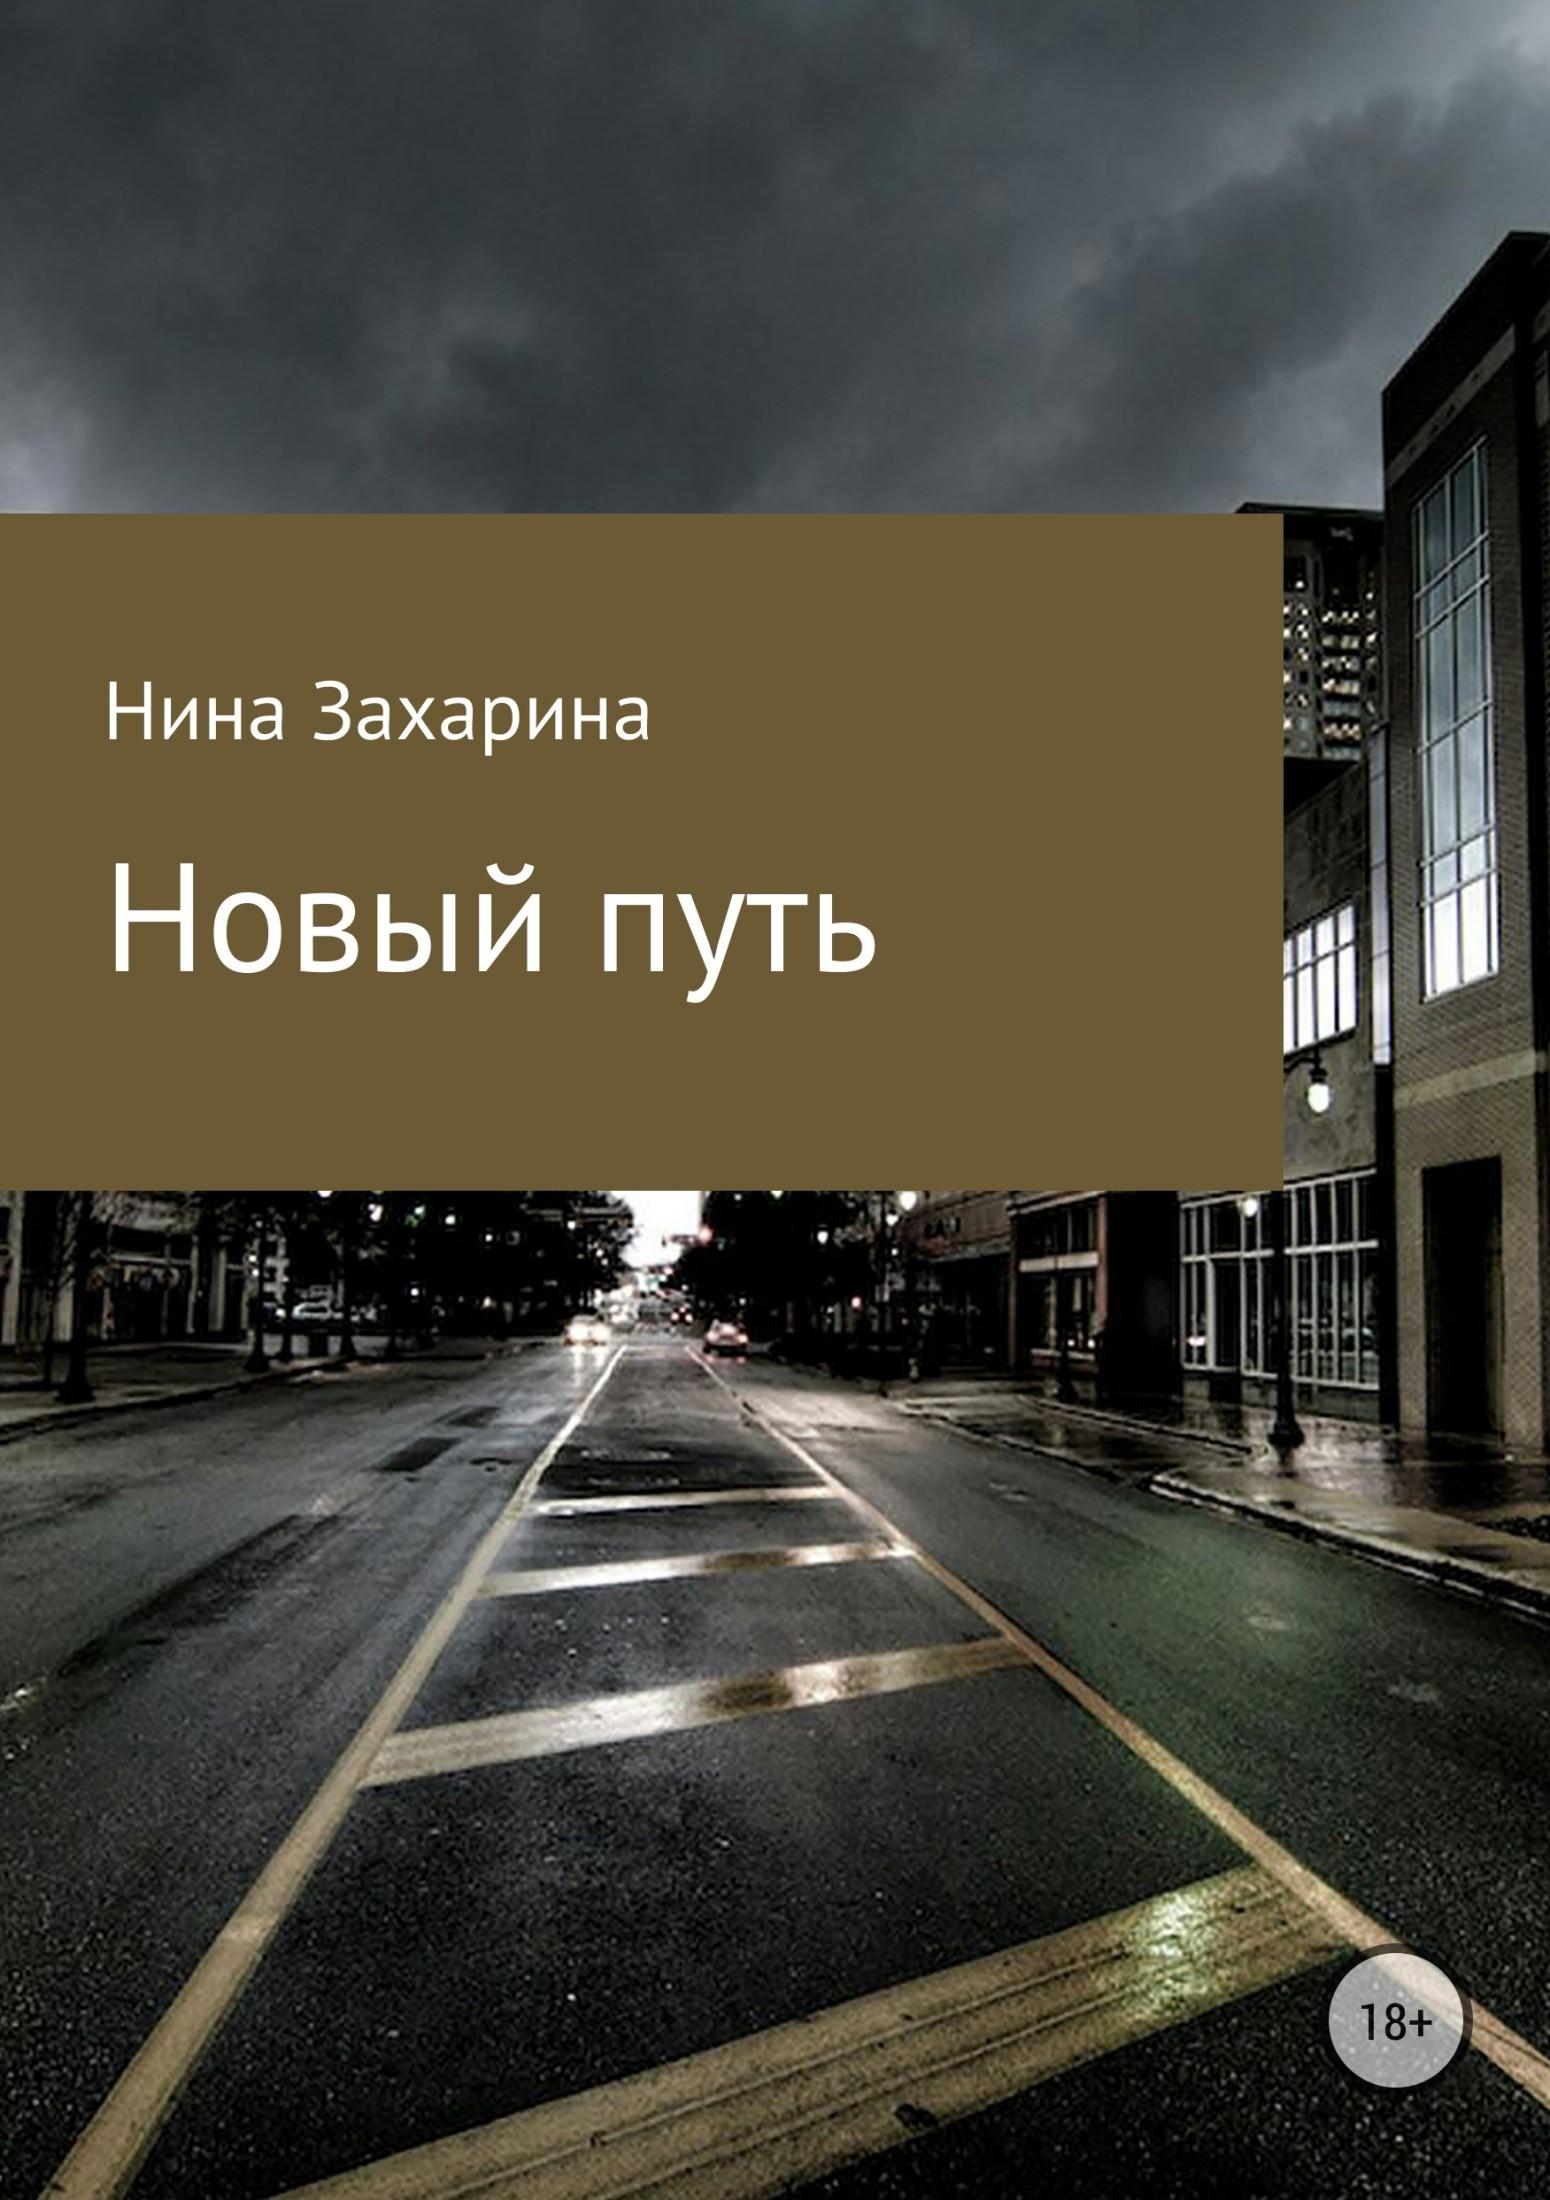 Нина Фёдоровна Захарина. Новый путь